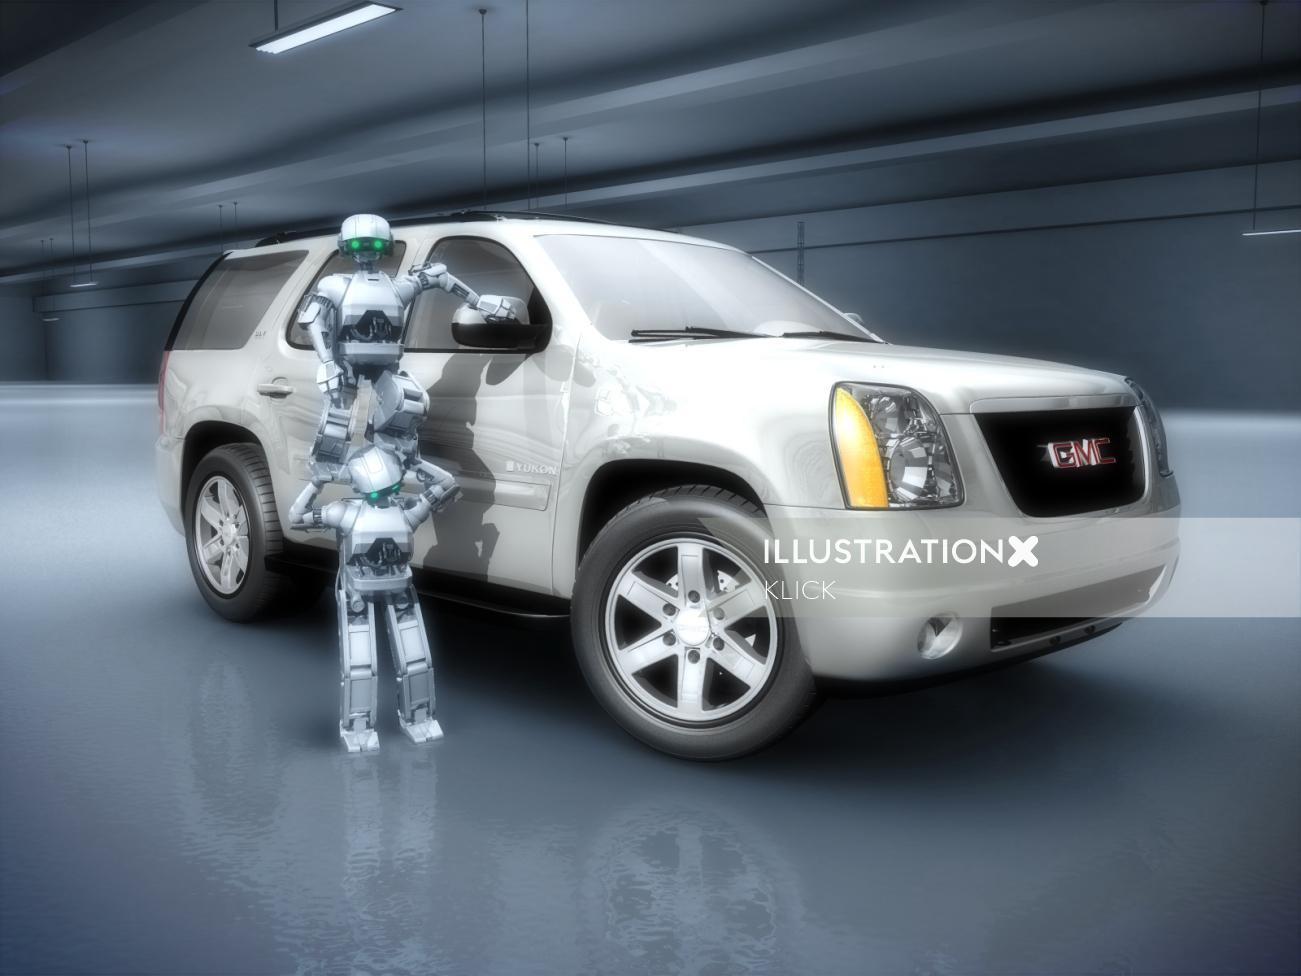 Photo realistic illustration of GMC Truck